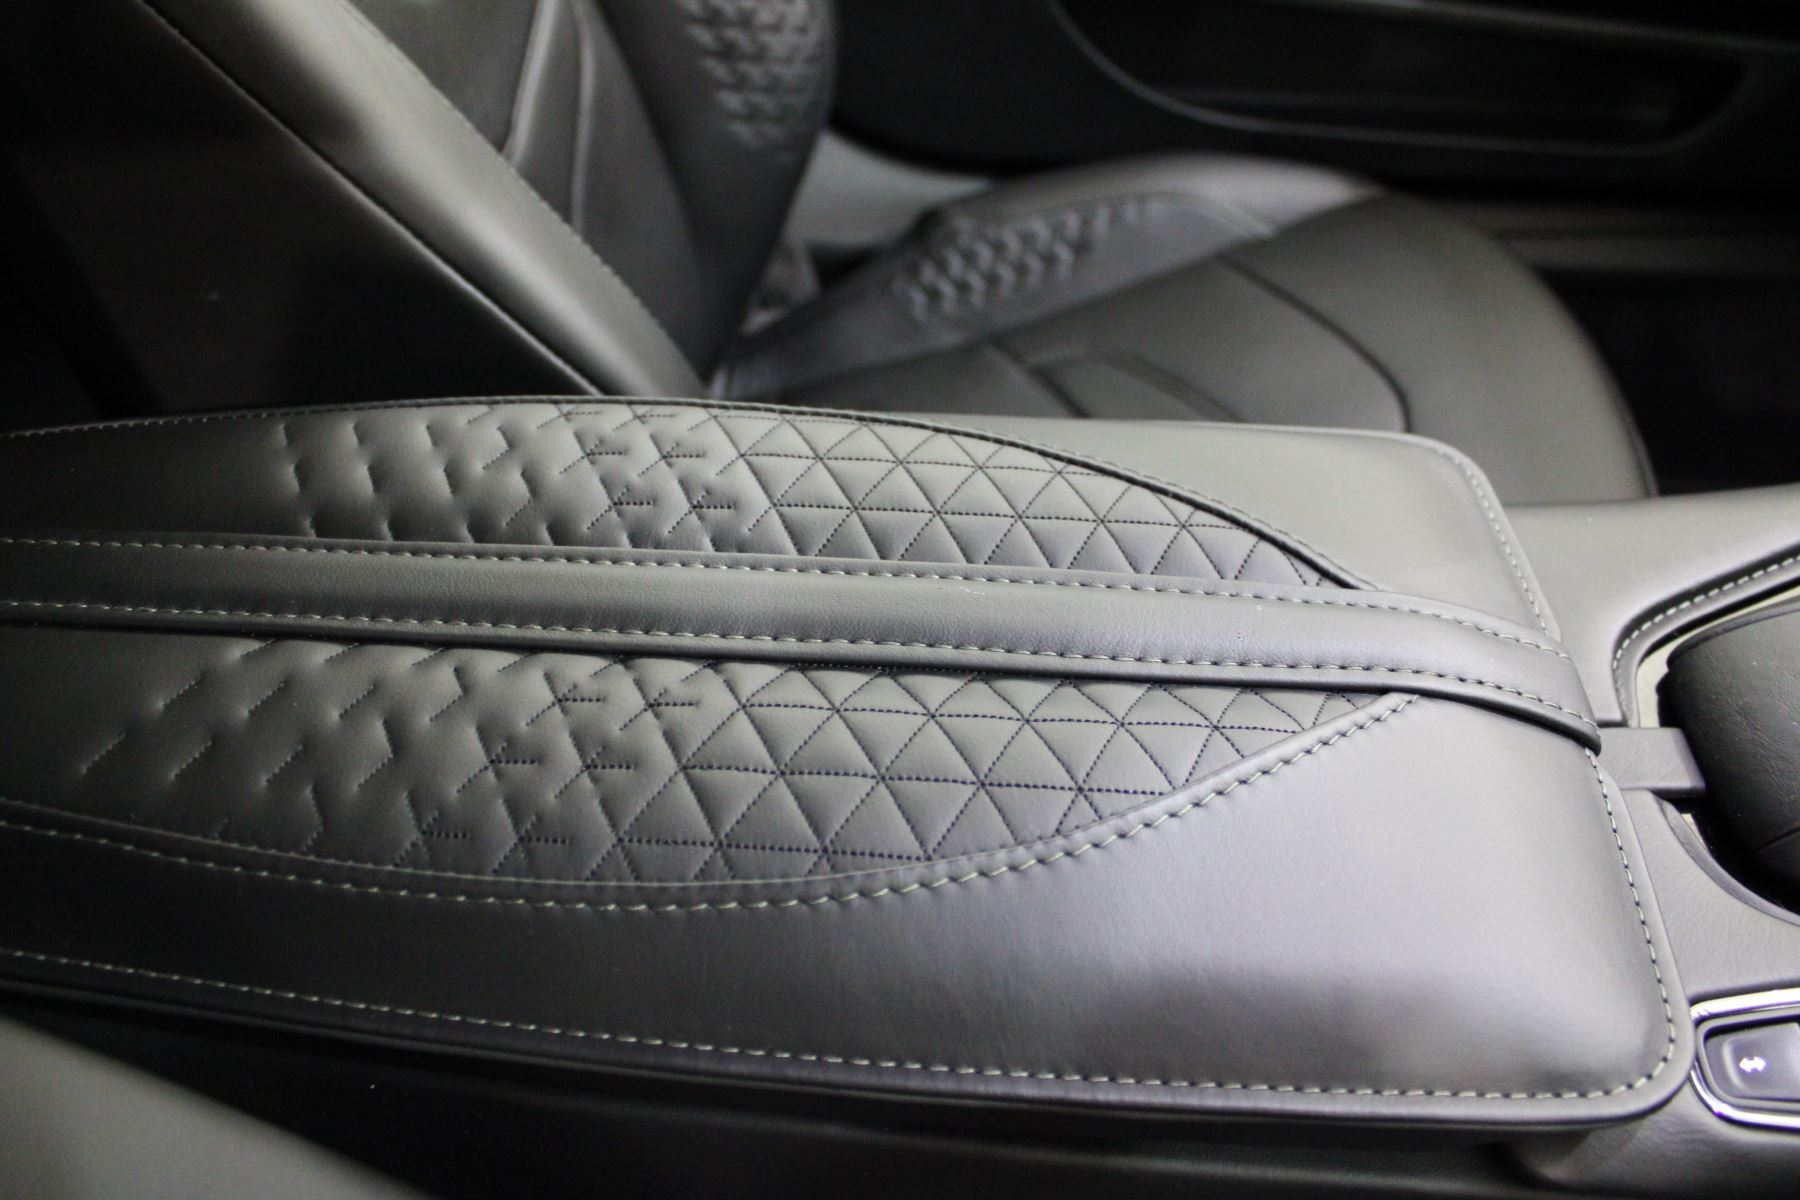 Aston Martin DBS V12 Superleggera 2dr Touchtronic image 26